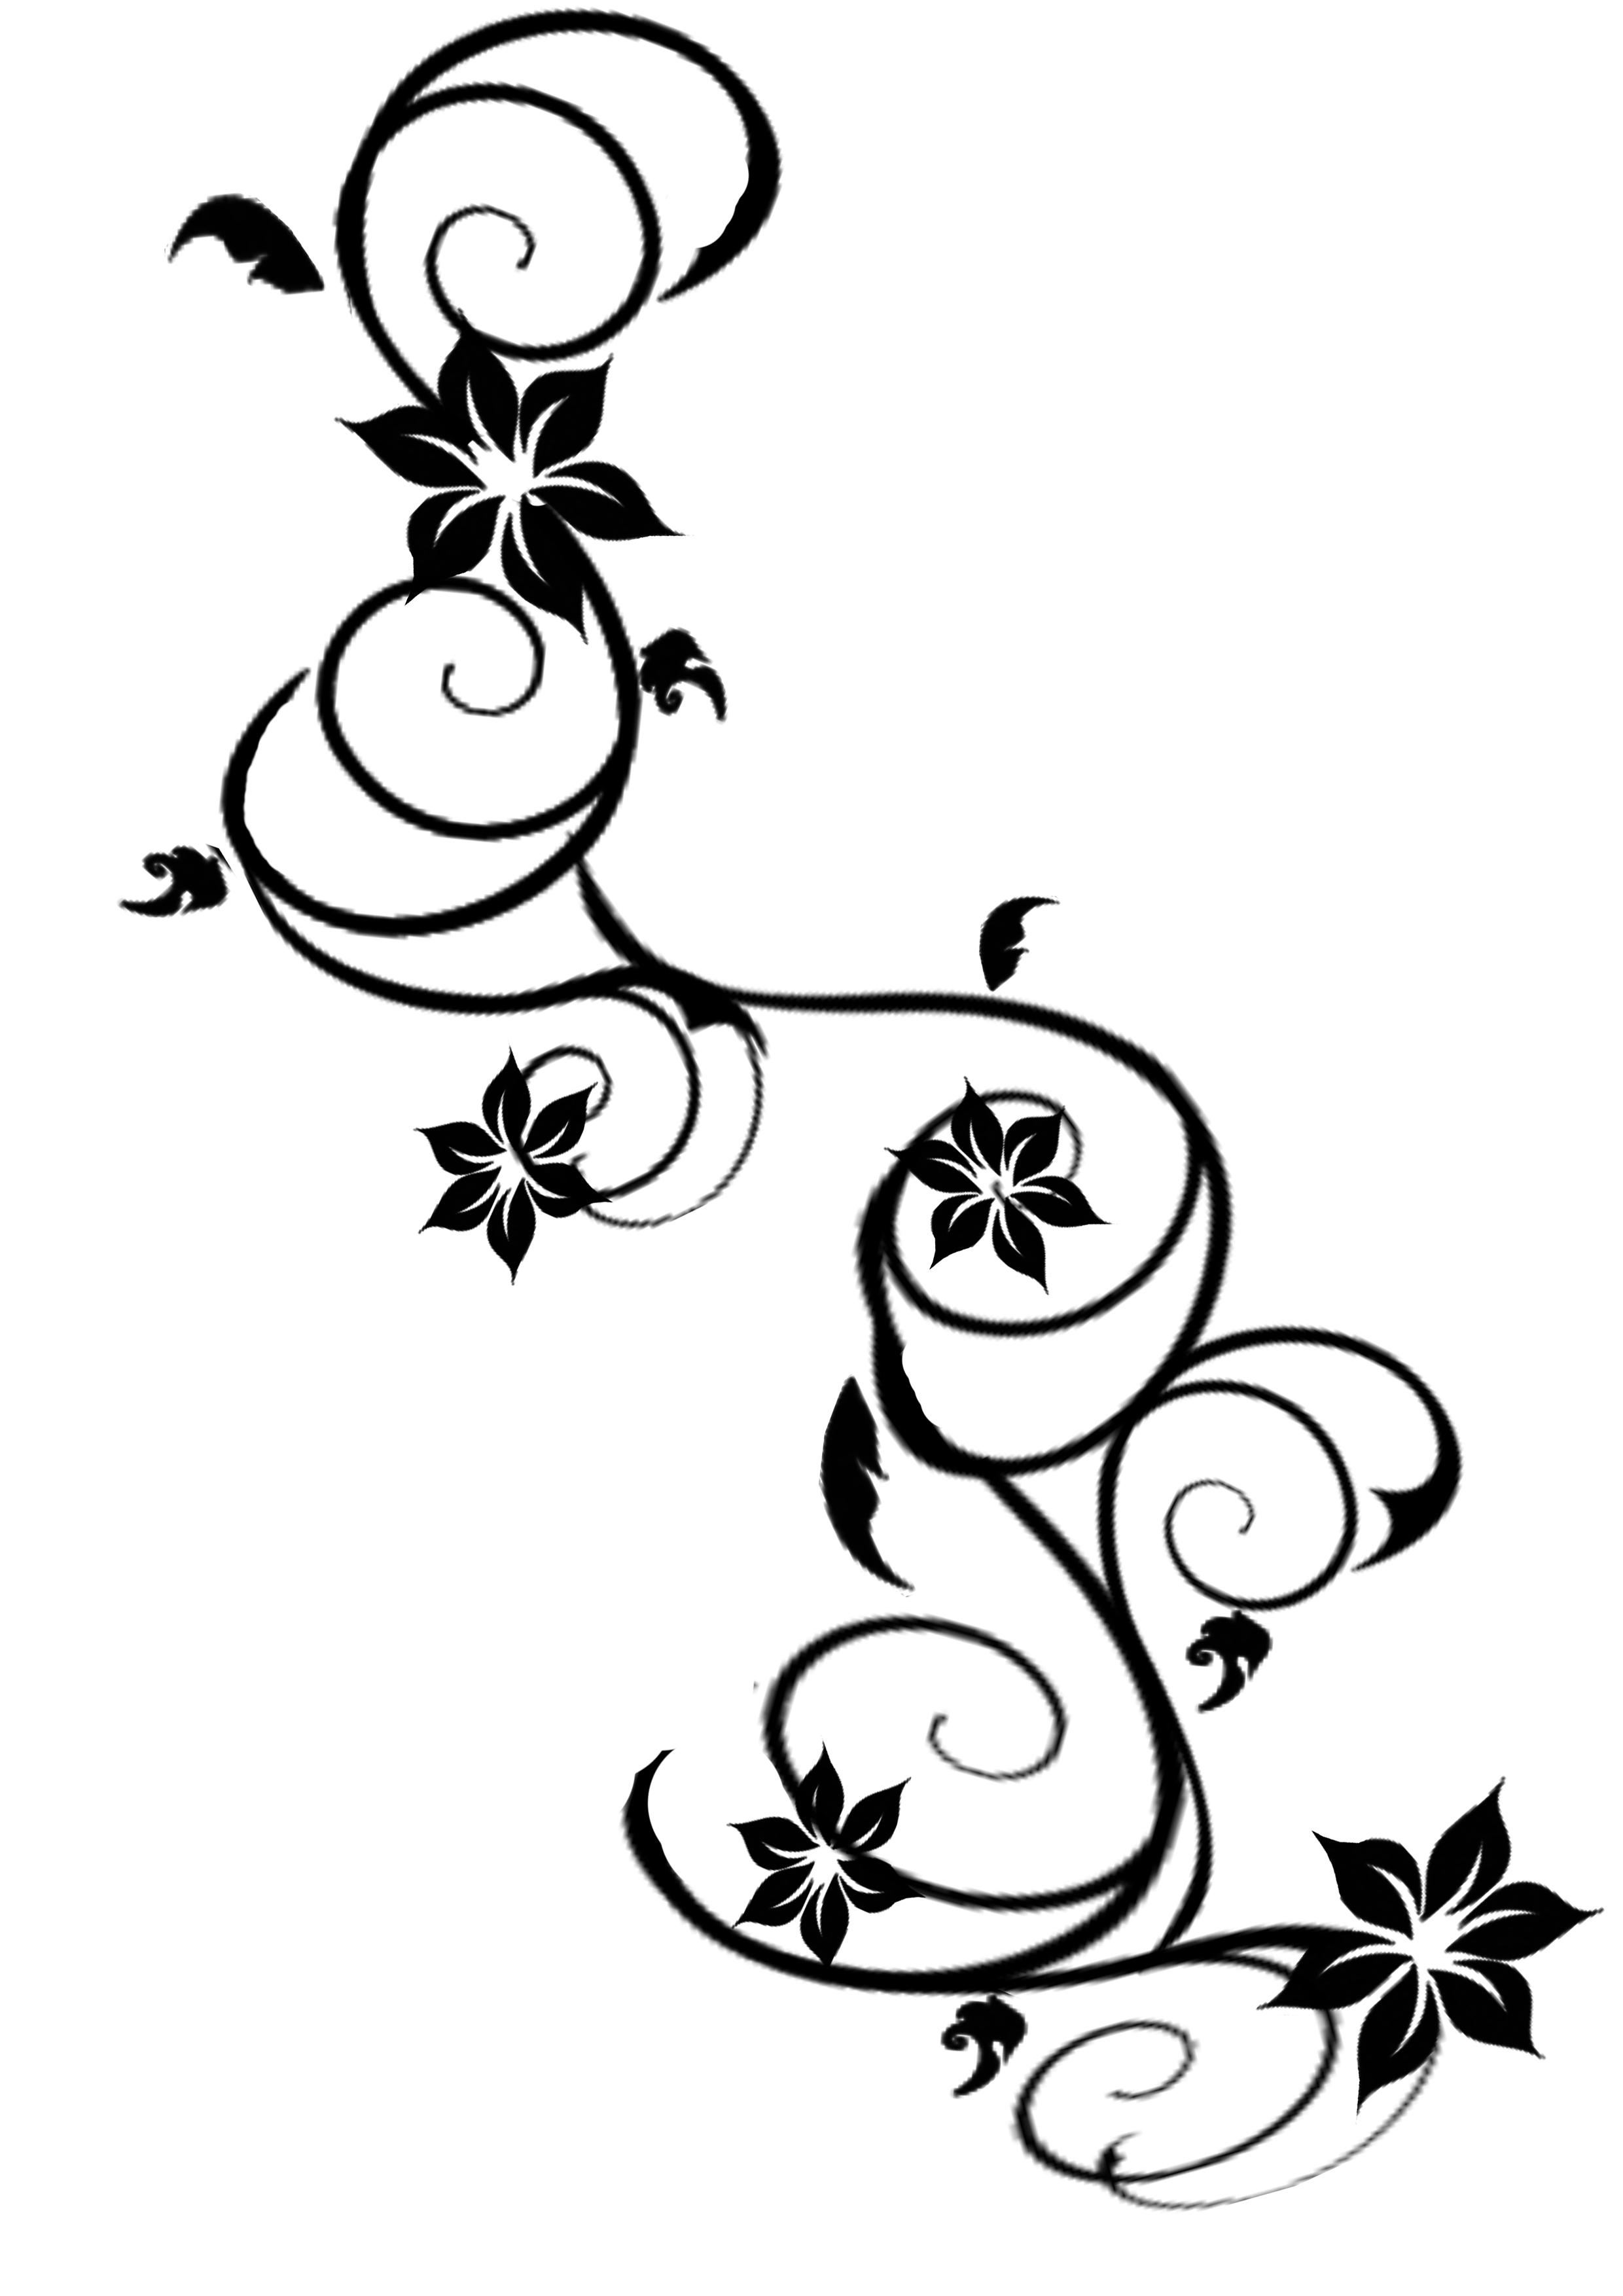 19 flowers vines design graphics images graphic design flowers clip art free vector art. Black Bedroom Furniture Sets. Home Design Ideas